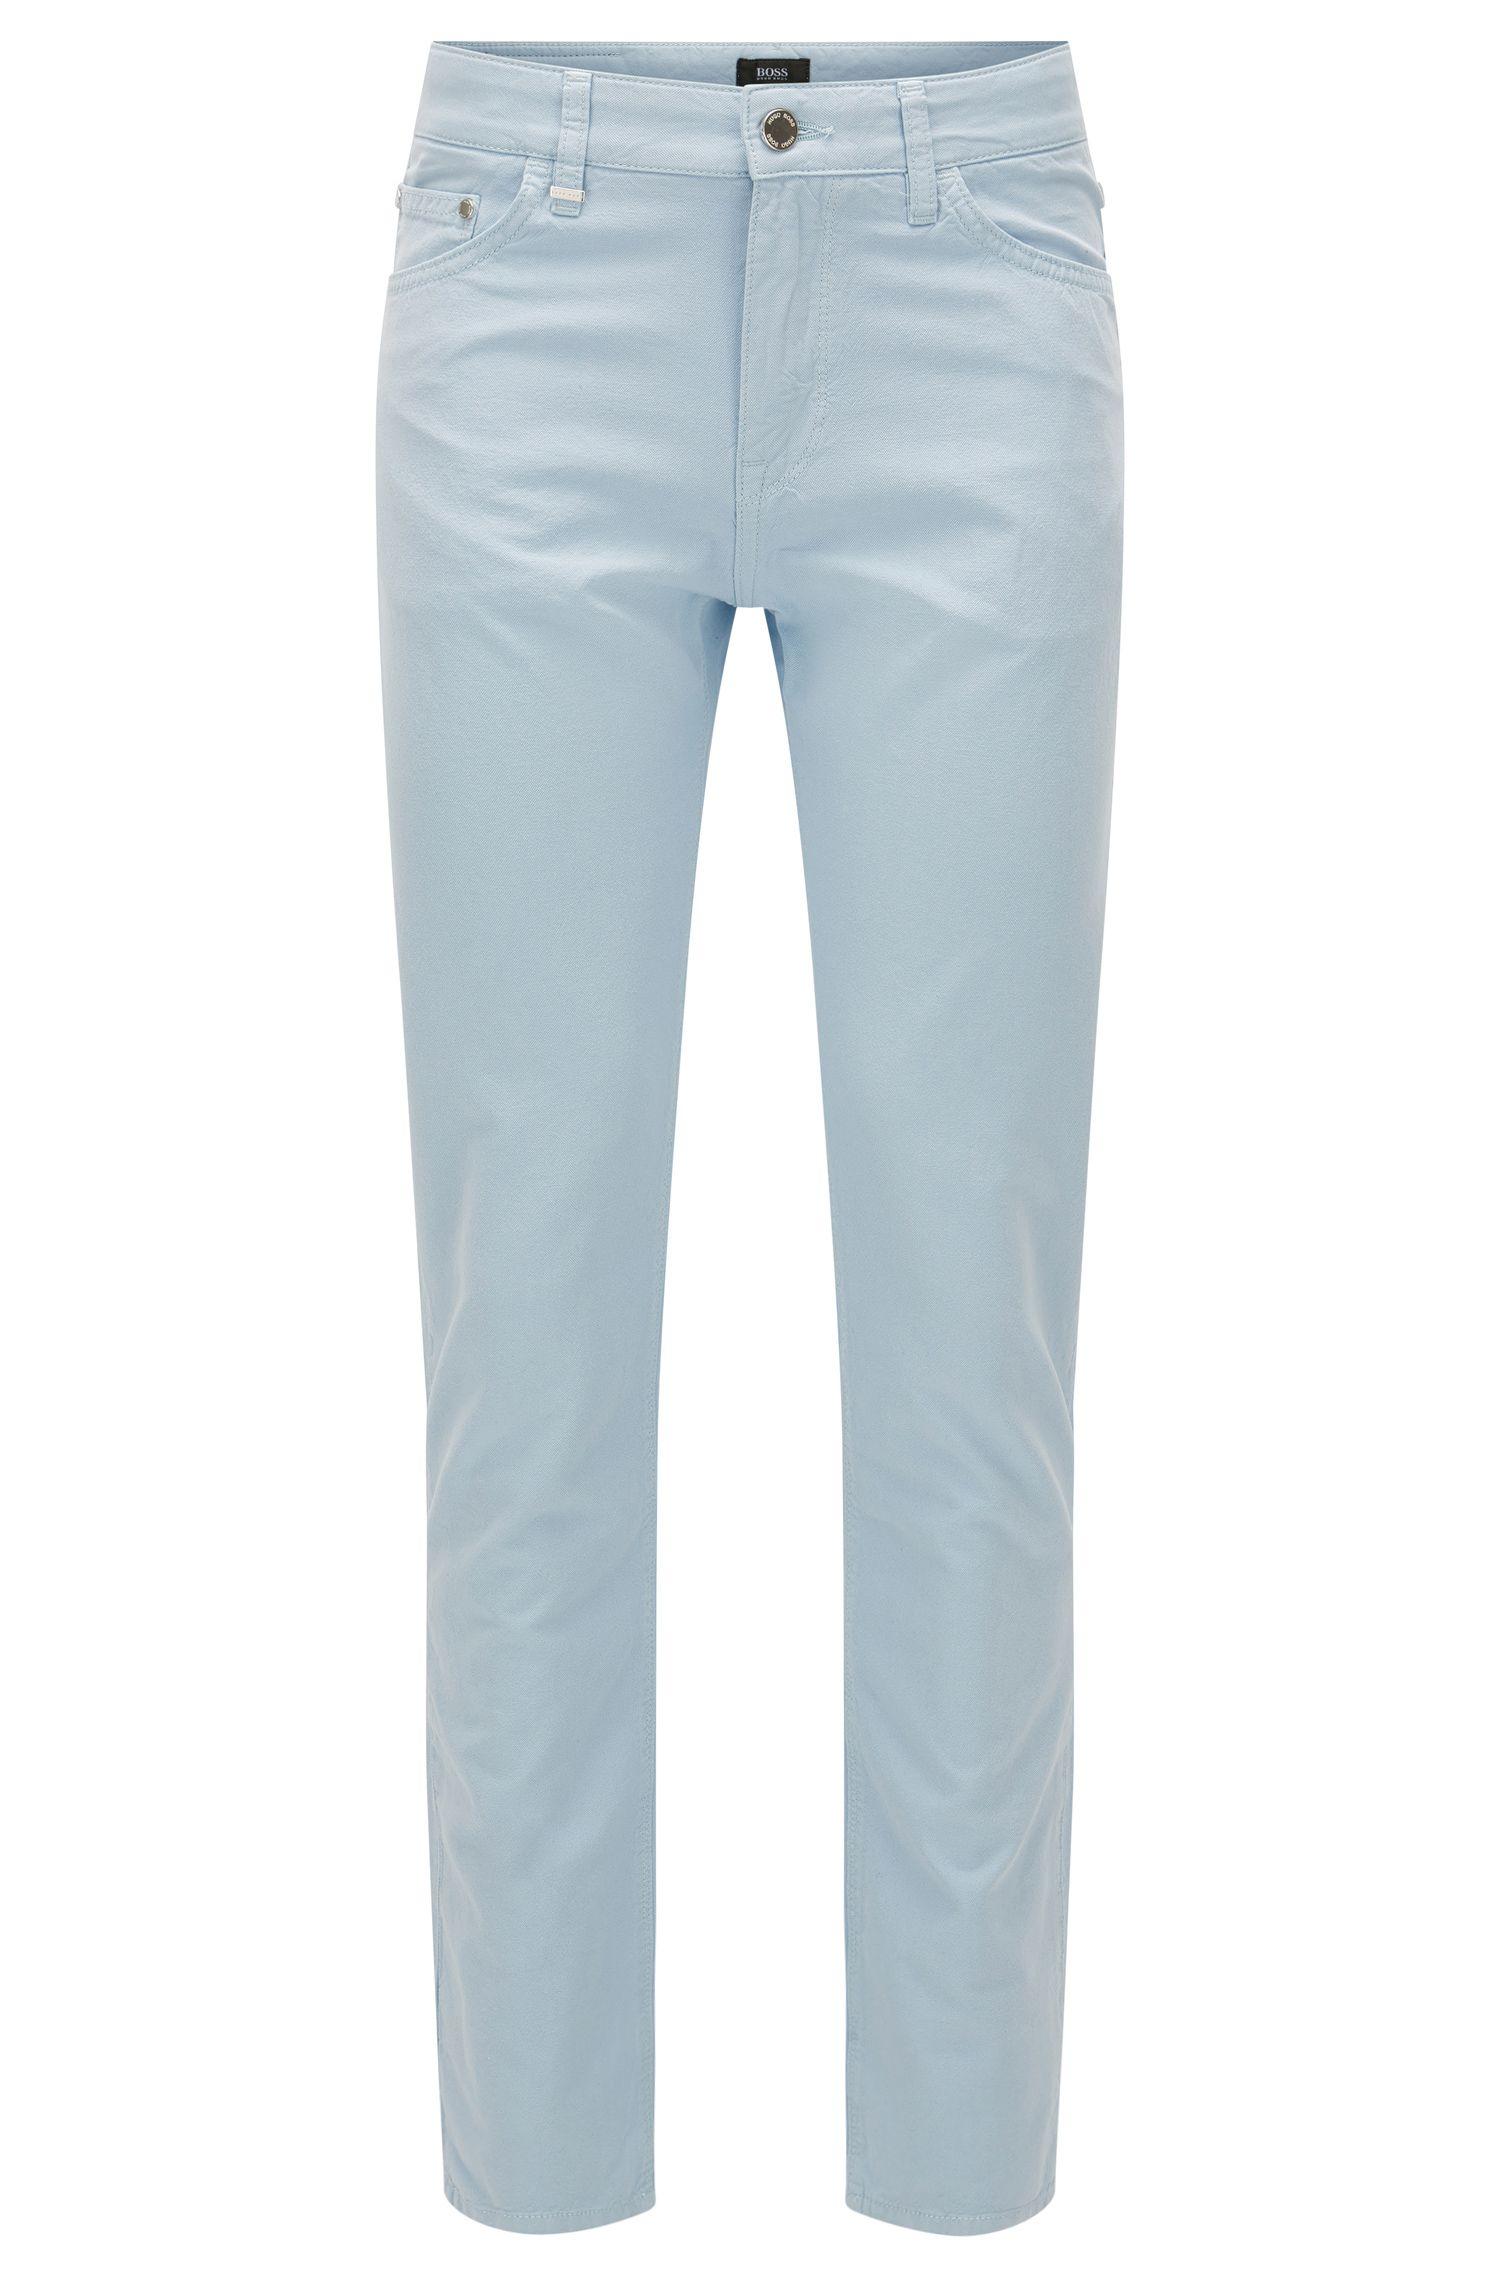 12 oz Italian Cotton Jeans, Regular Fit | Maine